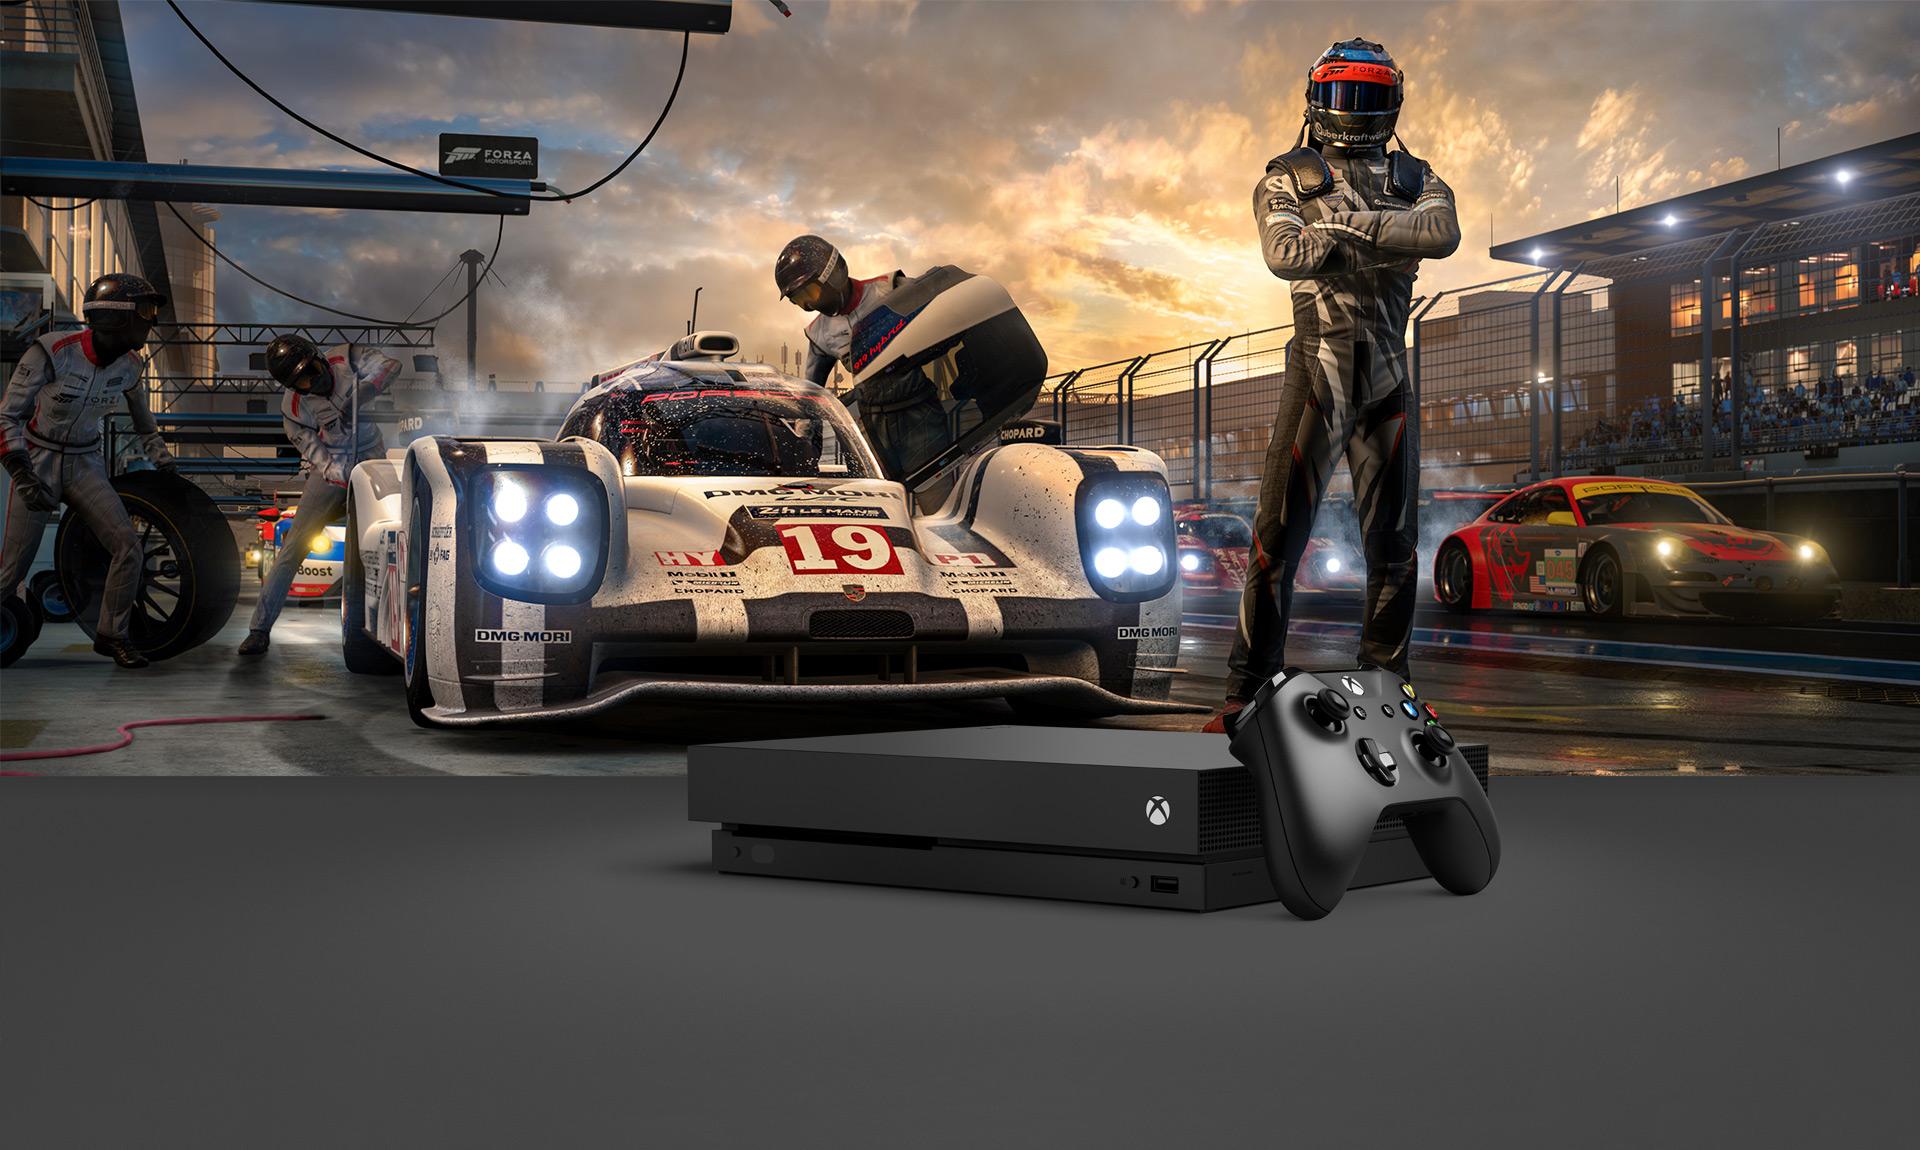 فهرست ۱۶۷ اتوموبیل اول Forza Motorsport 7 منتشر شد